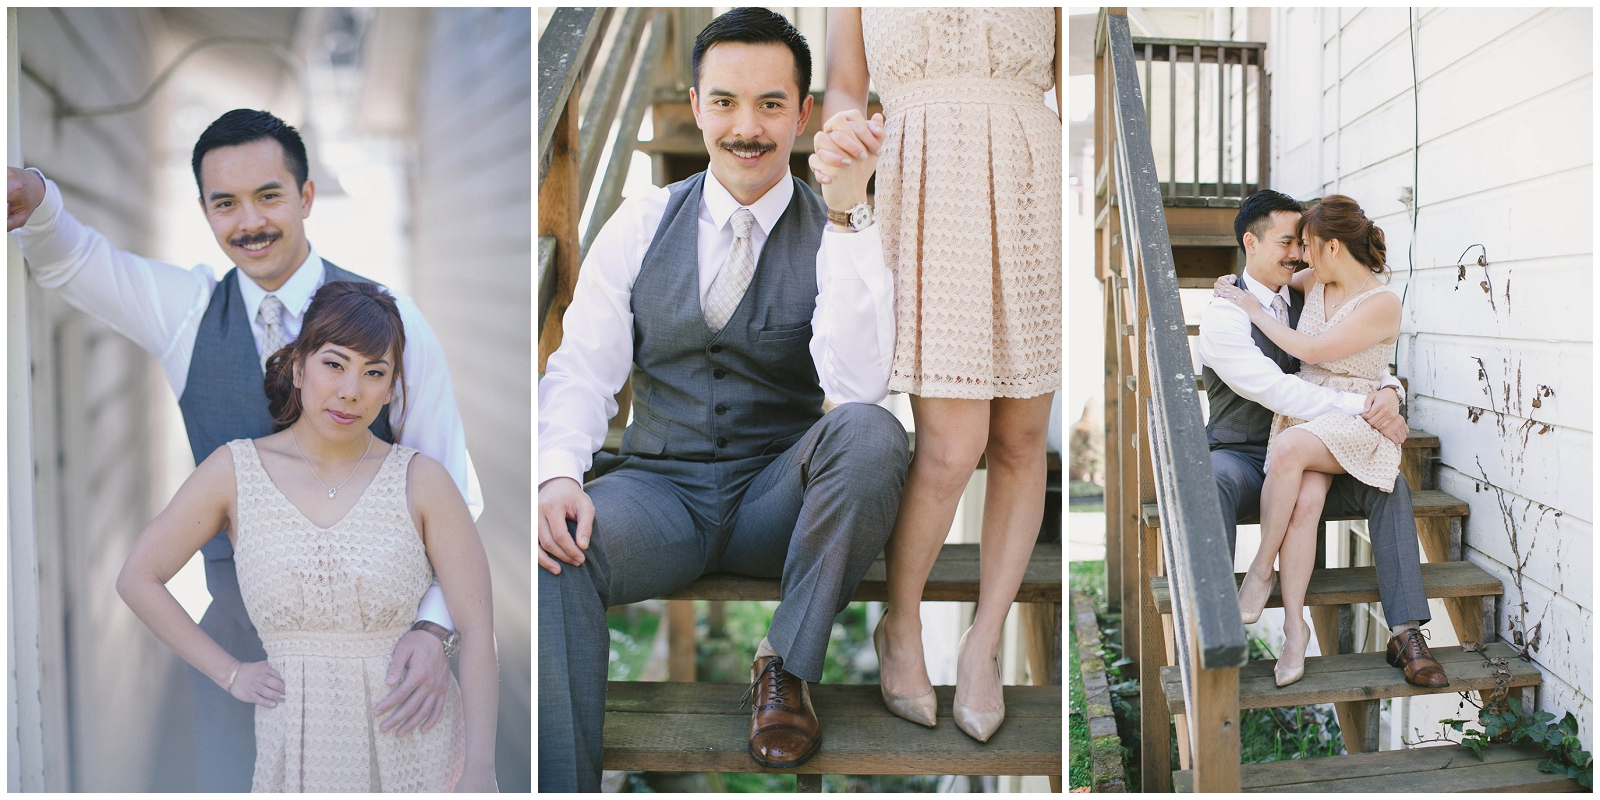 San-Francisco-Bay-Area-Wedding-Photography-Engagement-Treasure-Island-6.jpg